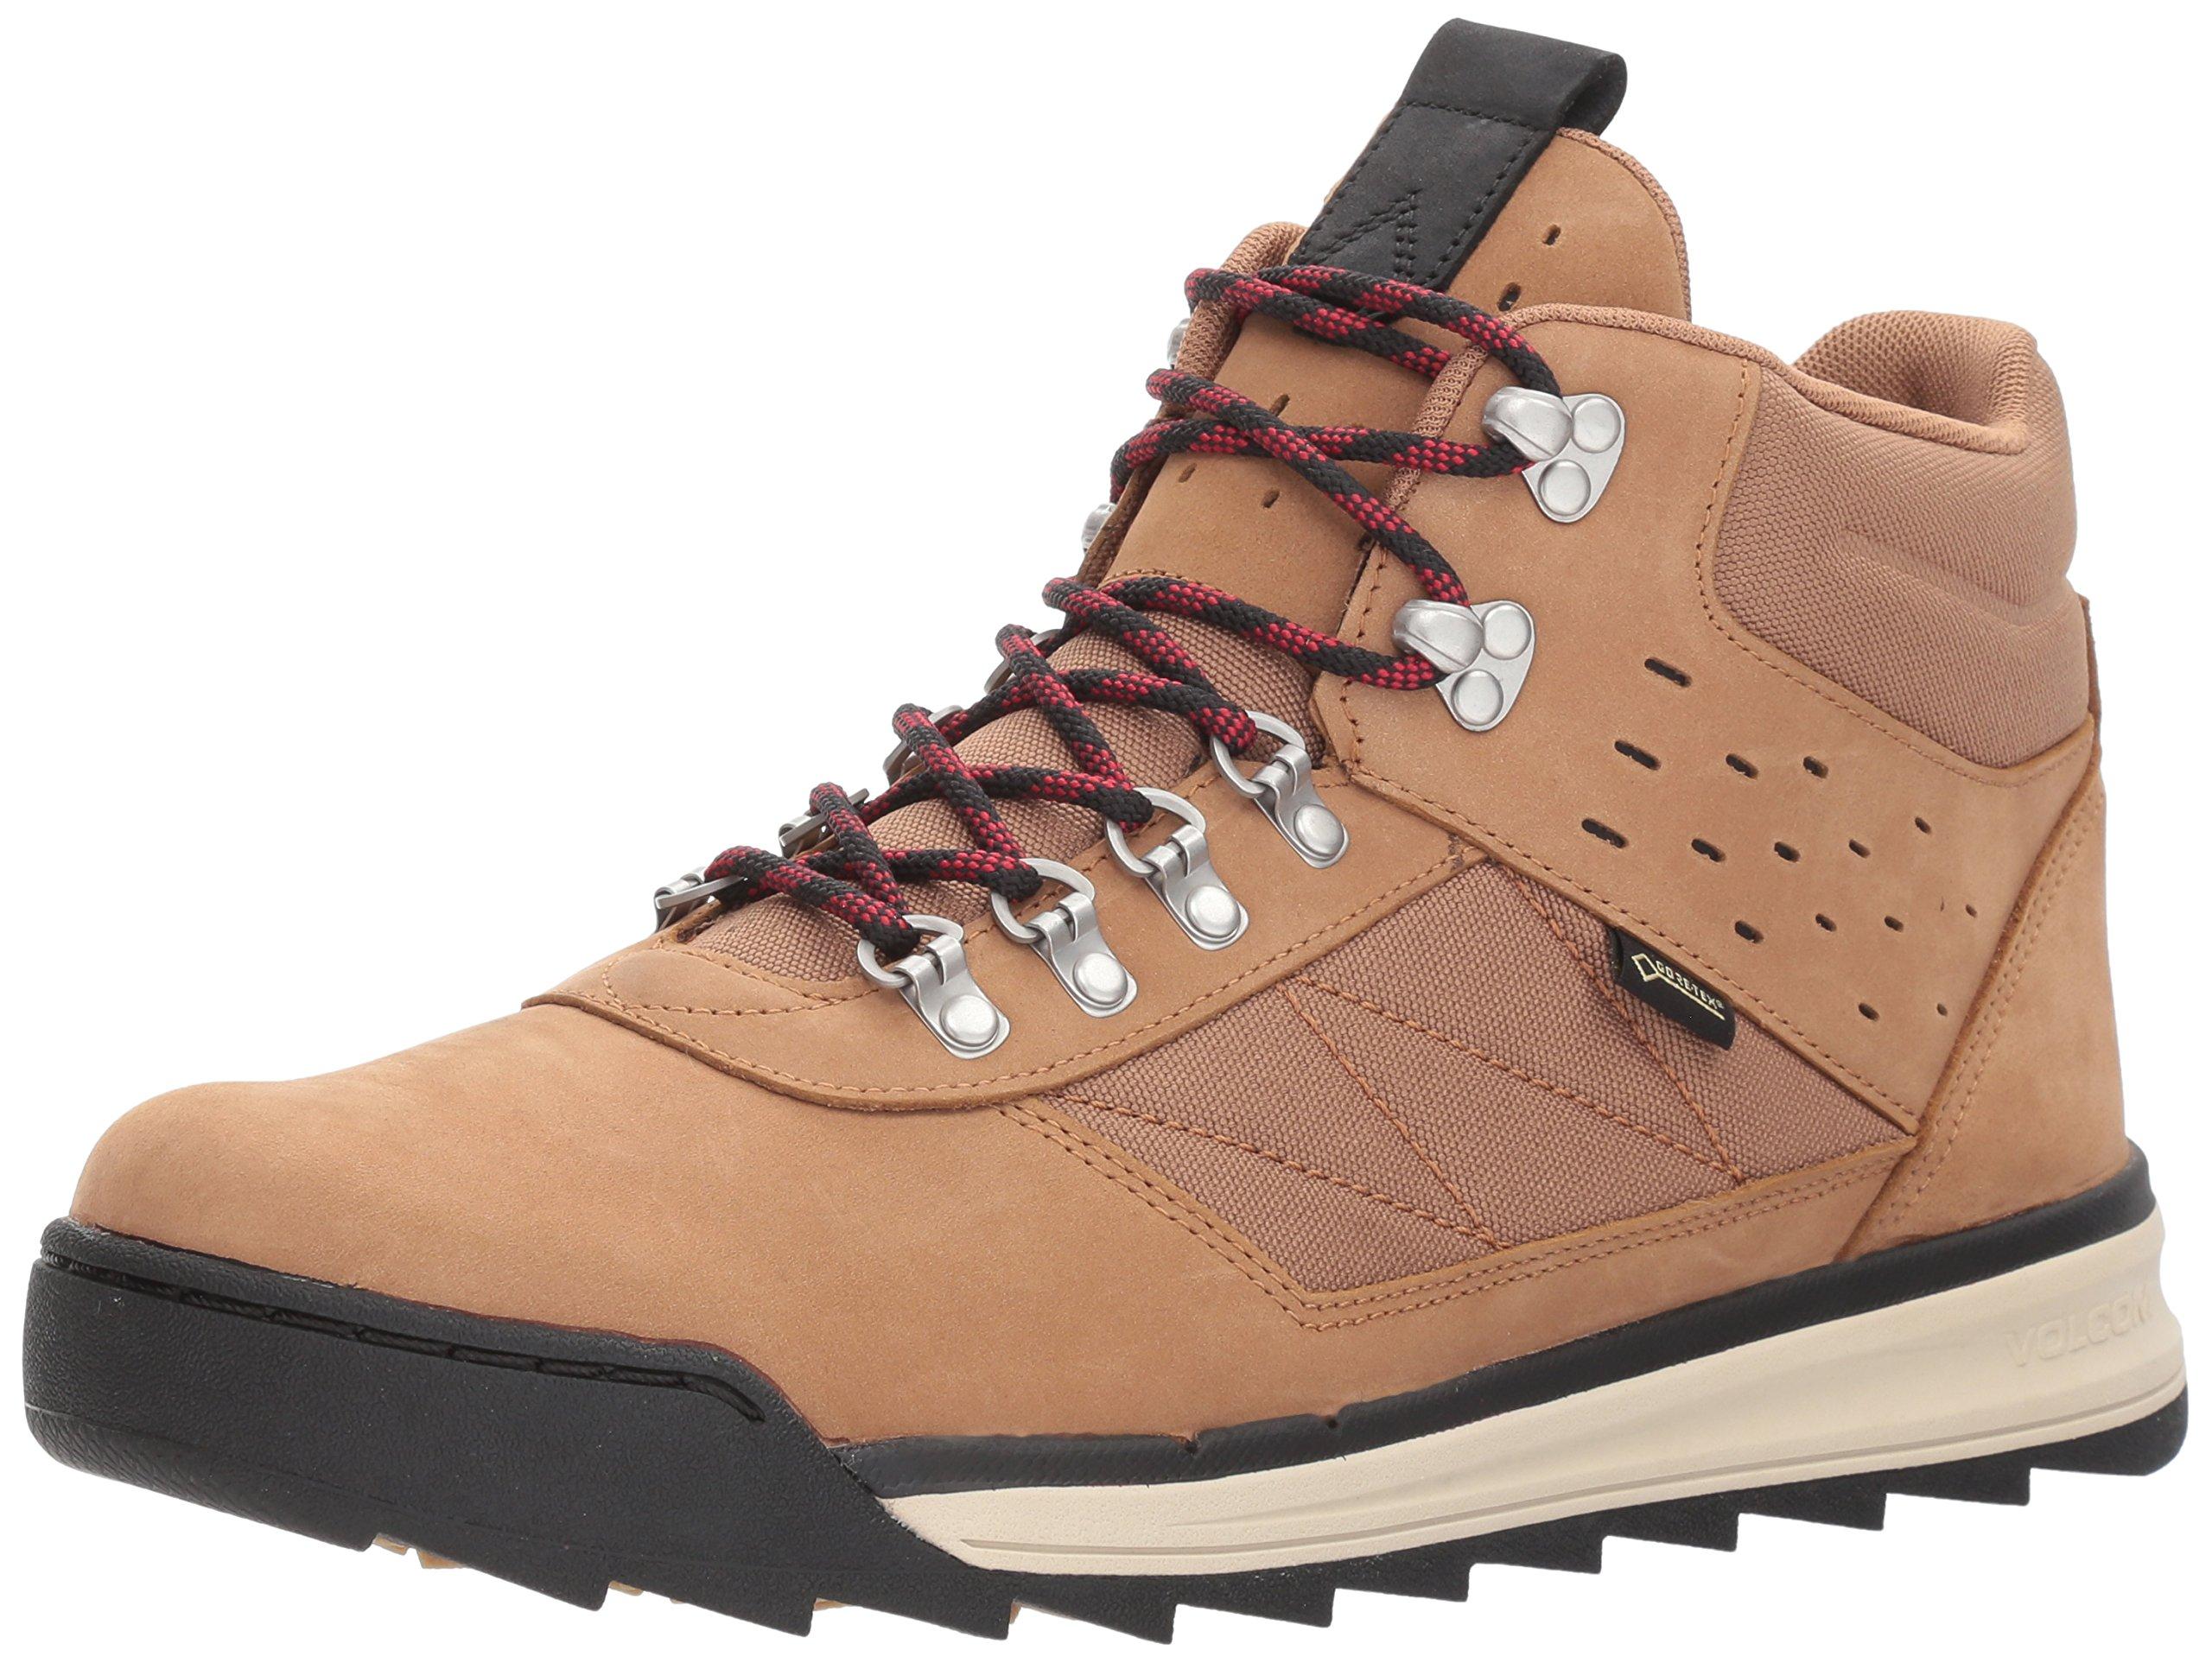 Volcom Men's Shelterlen GTX Boot Winter, Vintage Brown, 10 US/10 D US